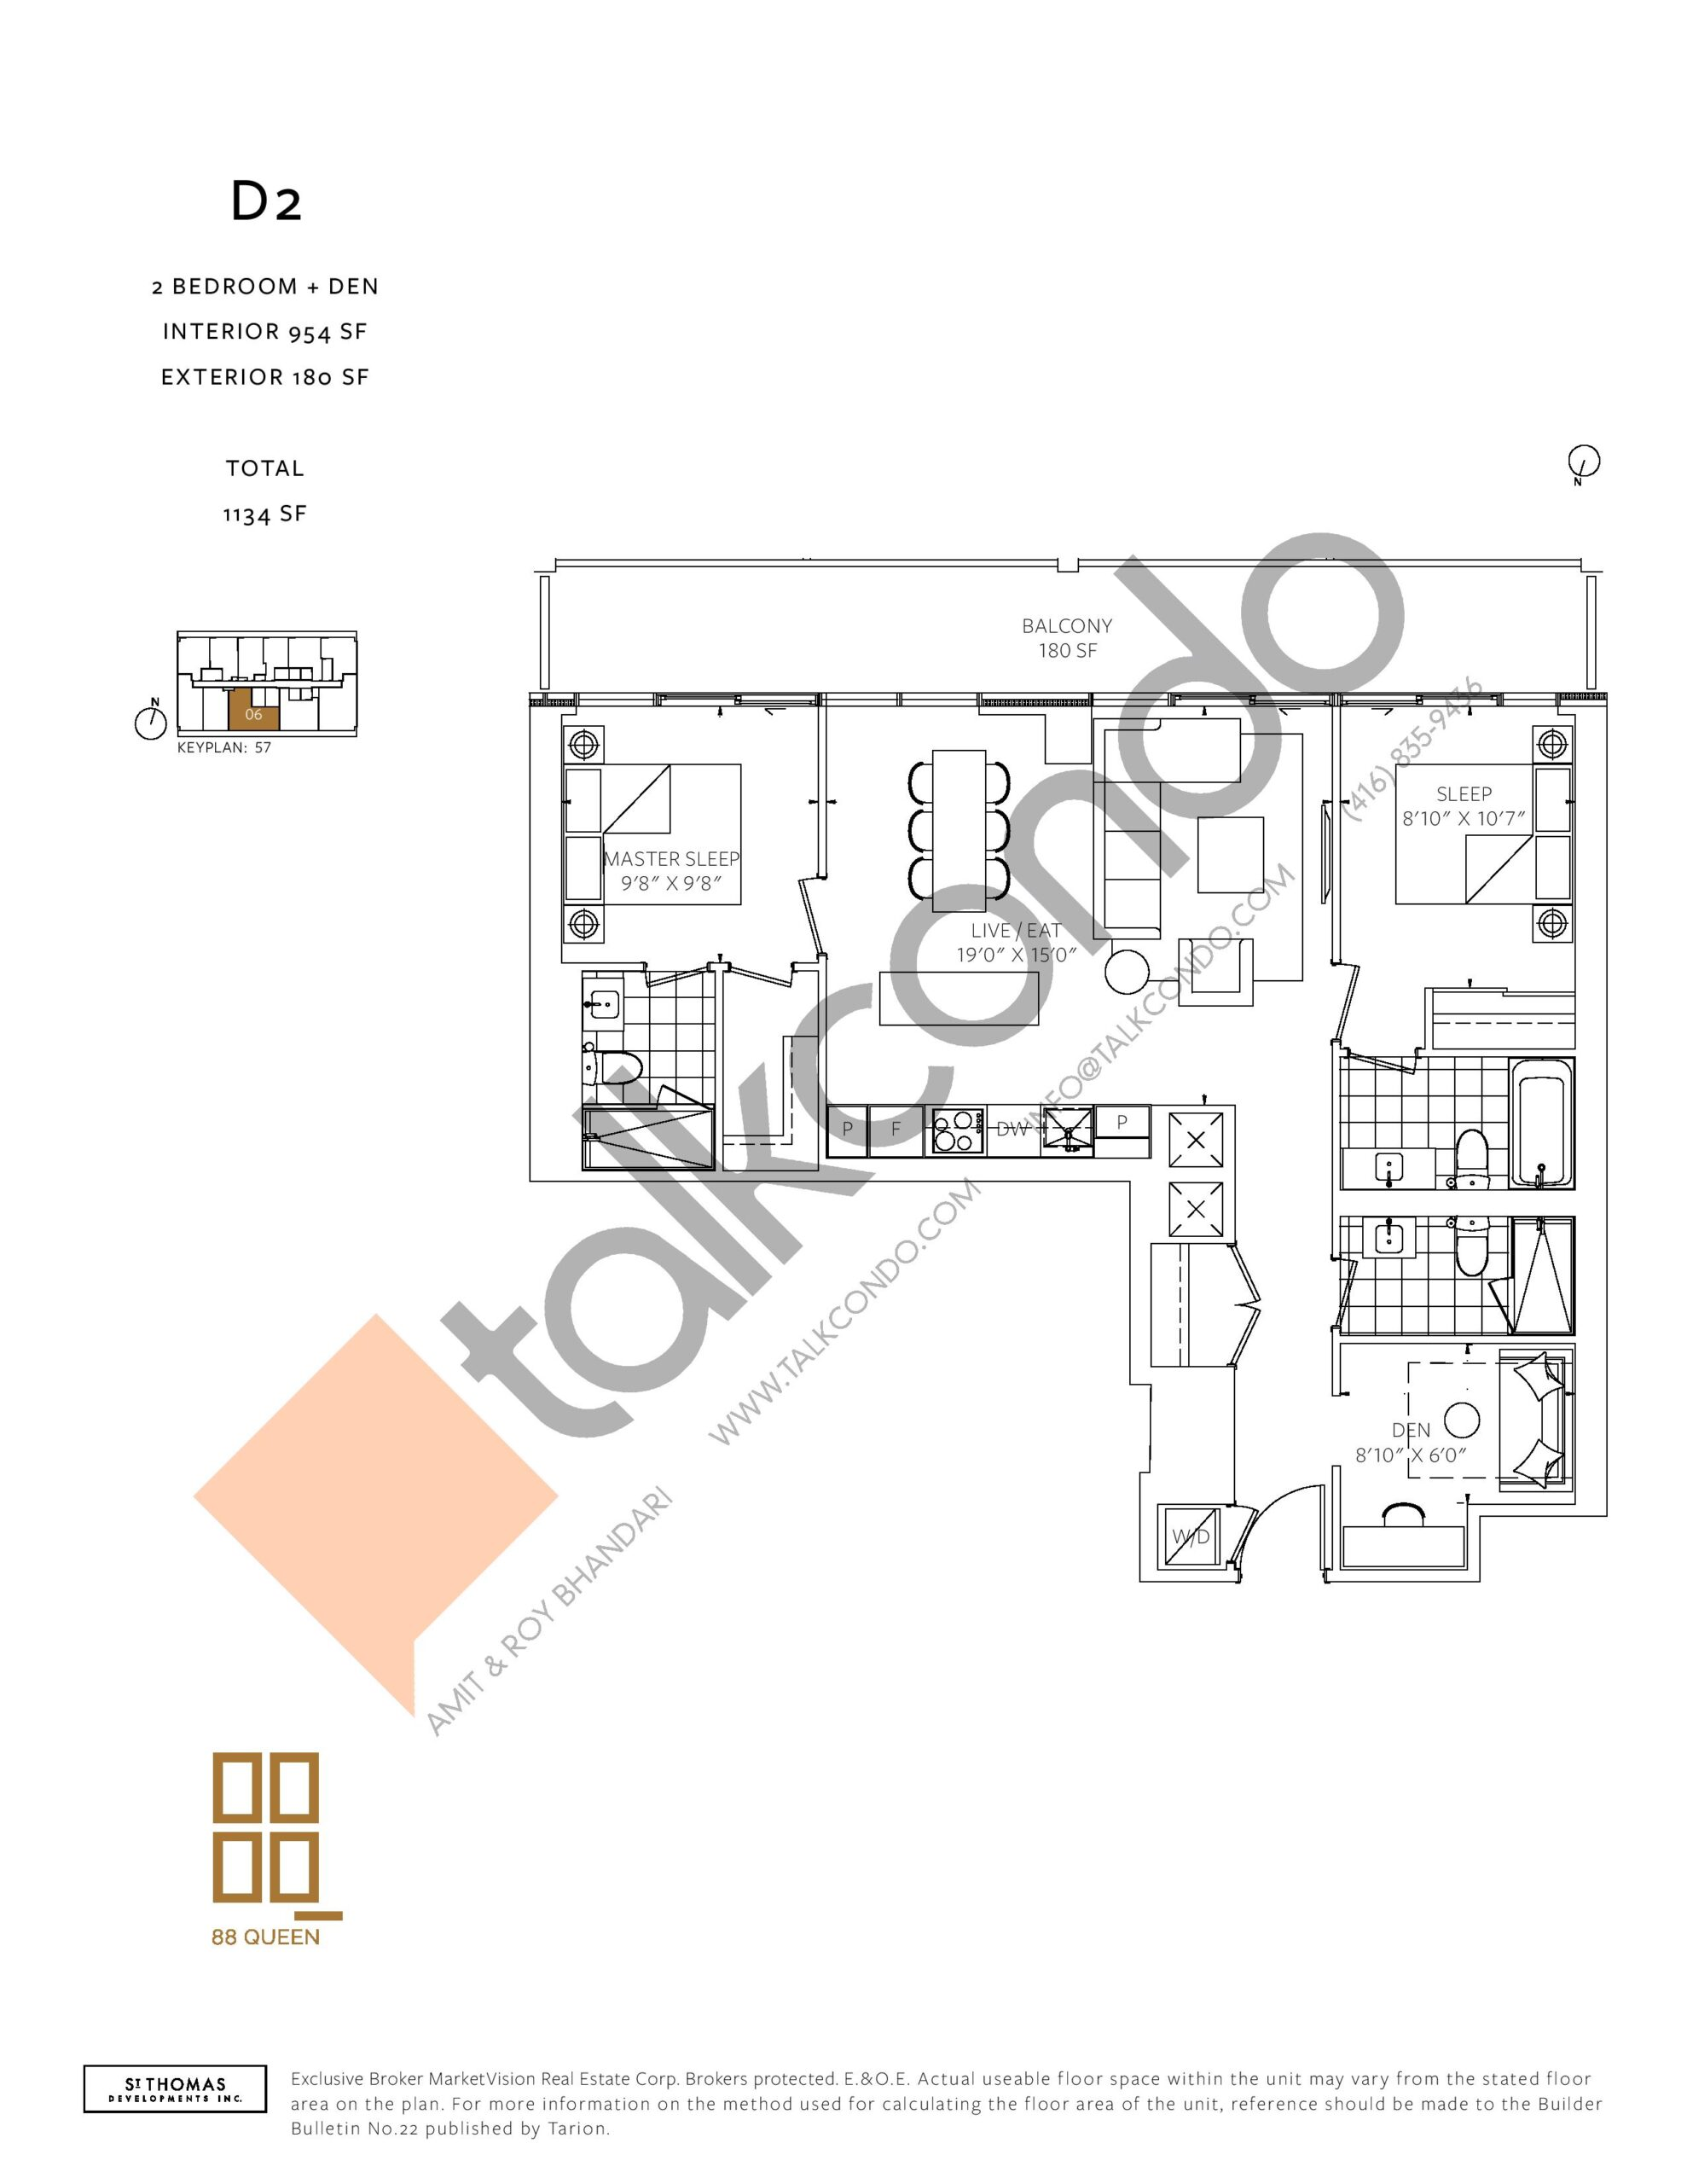 88 Queen Condos Phase 2 Floor Plans Prices Availability Talkcondo